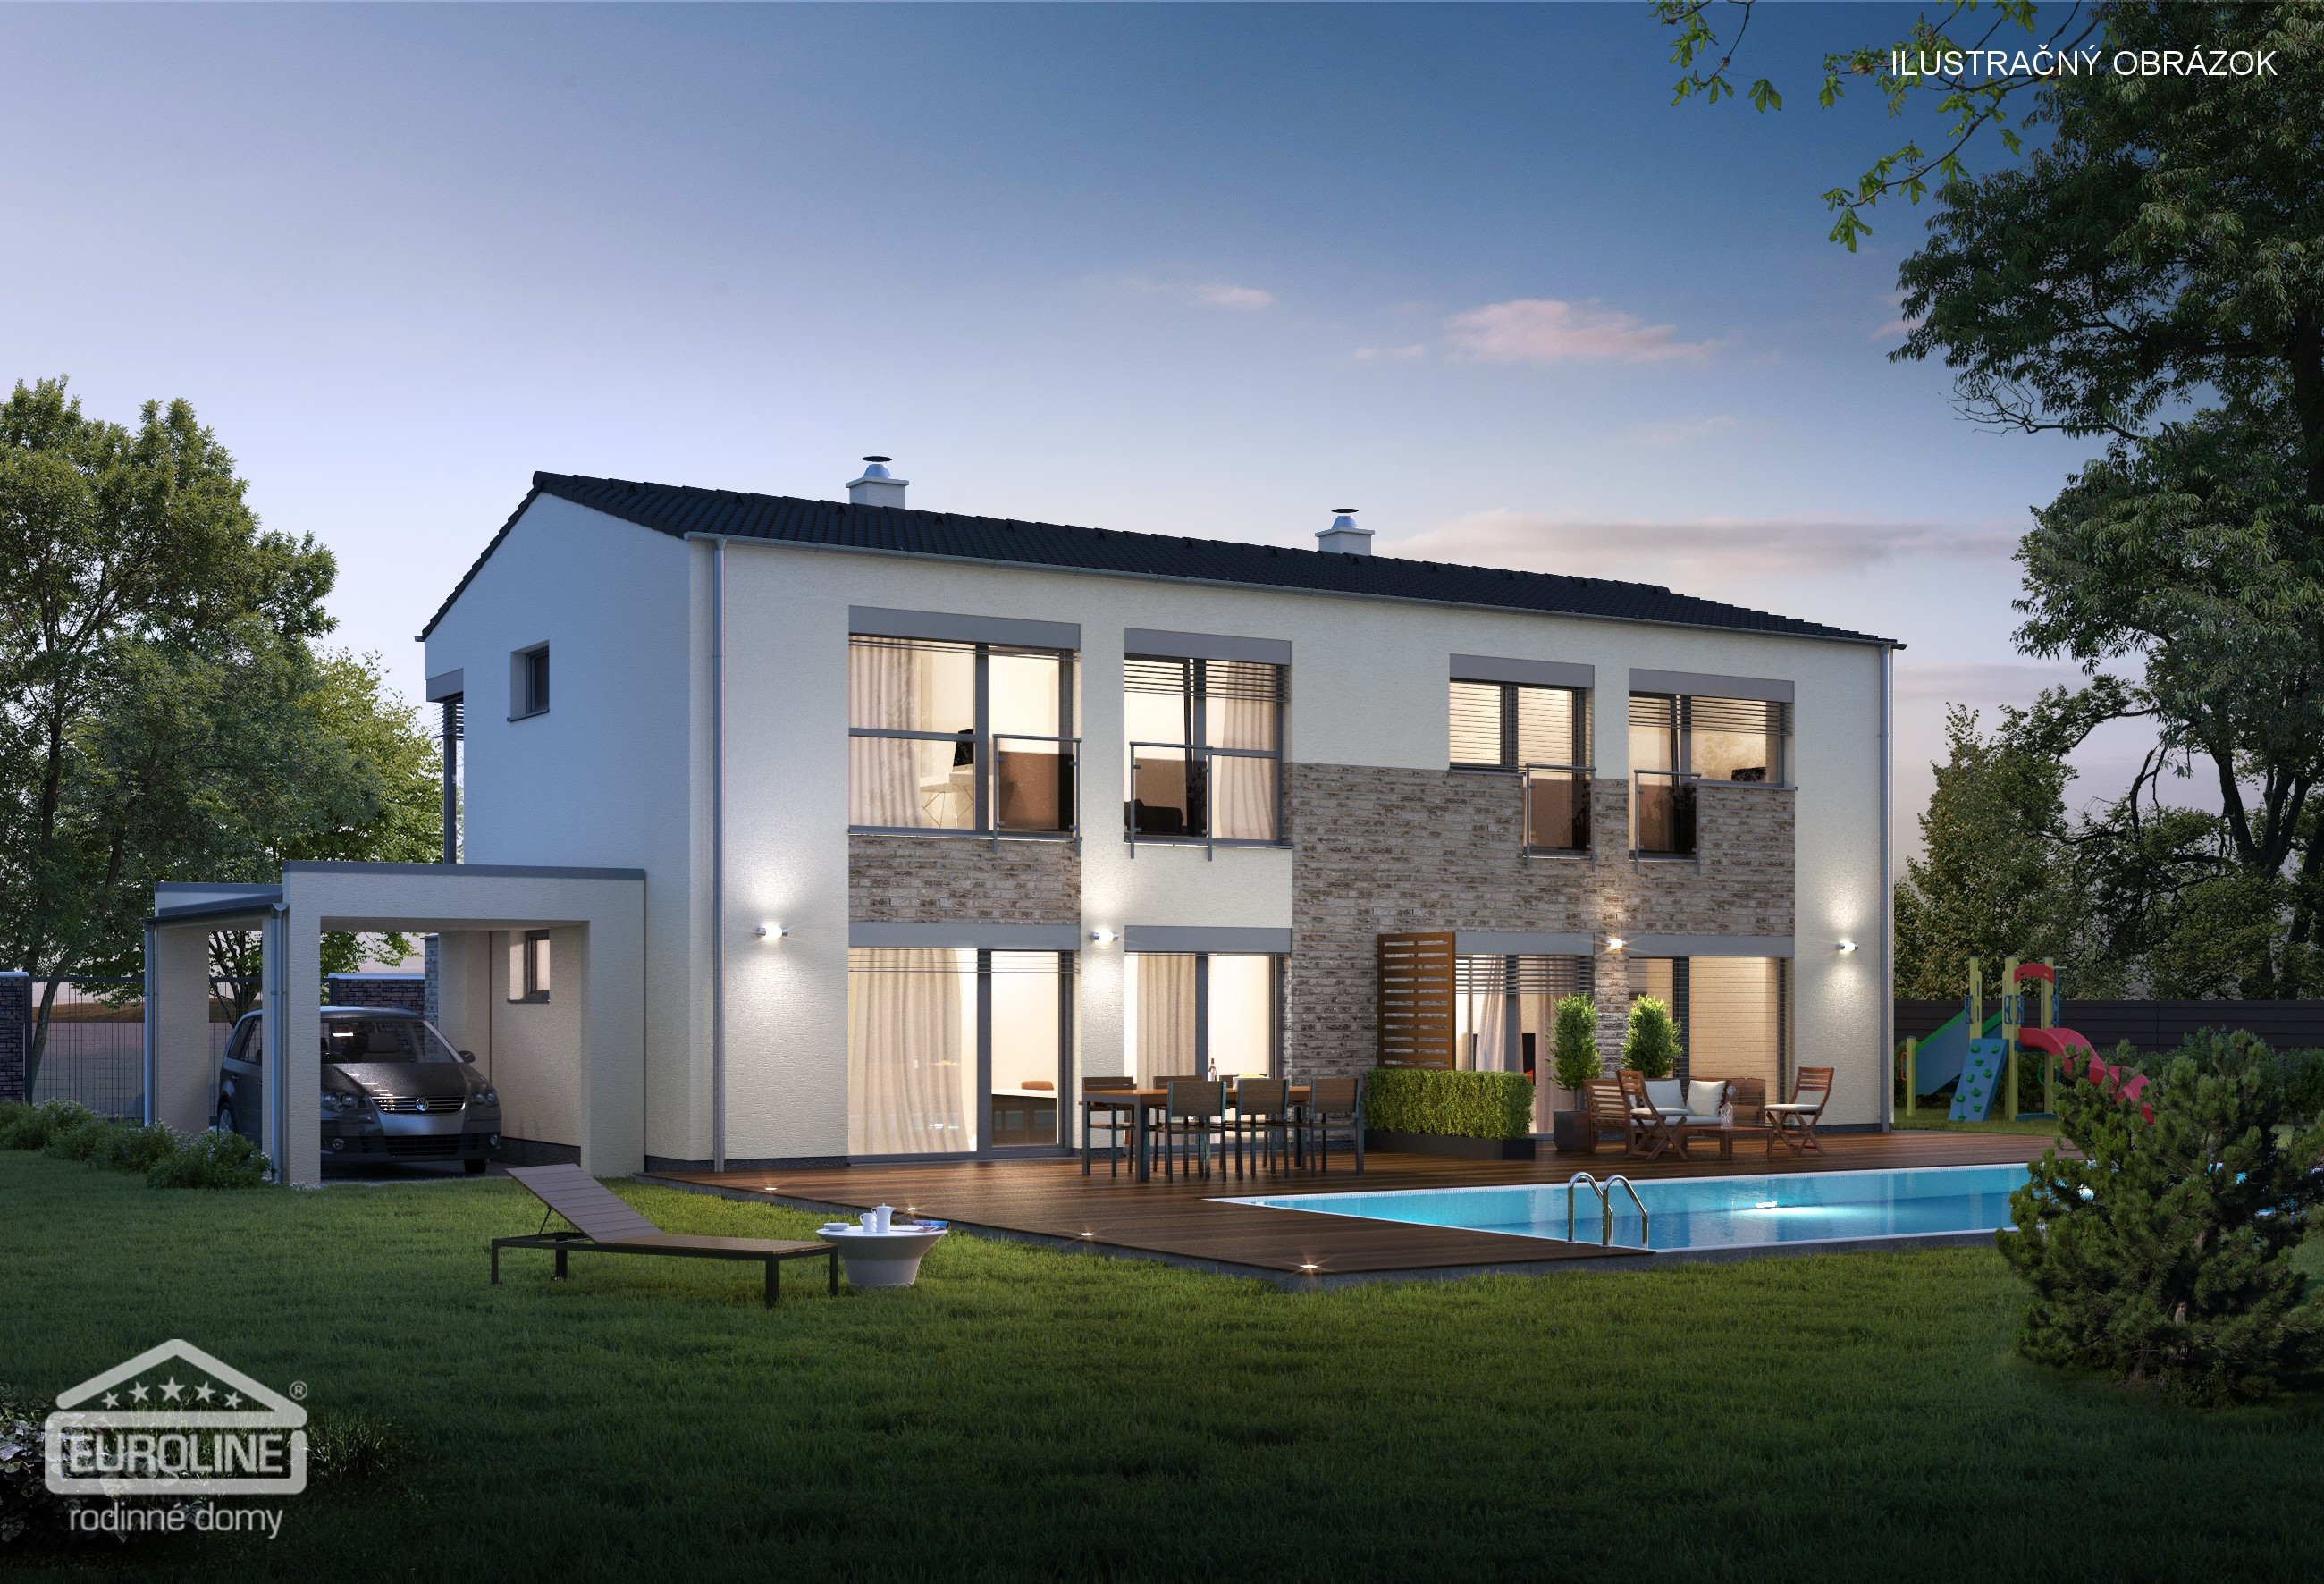 obrázok domu